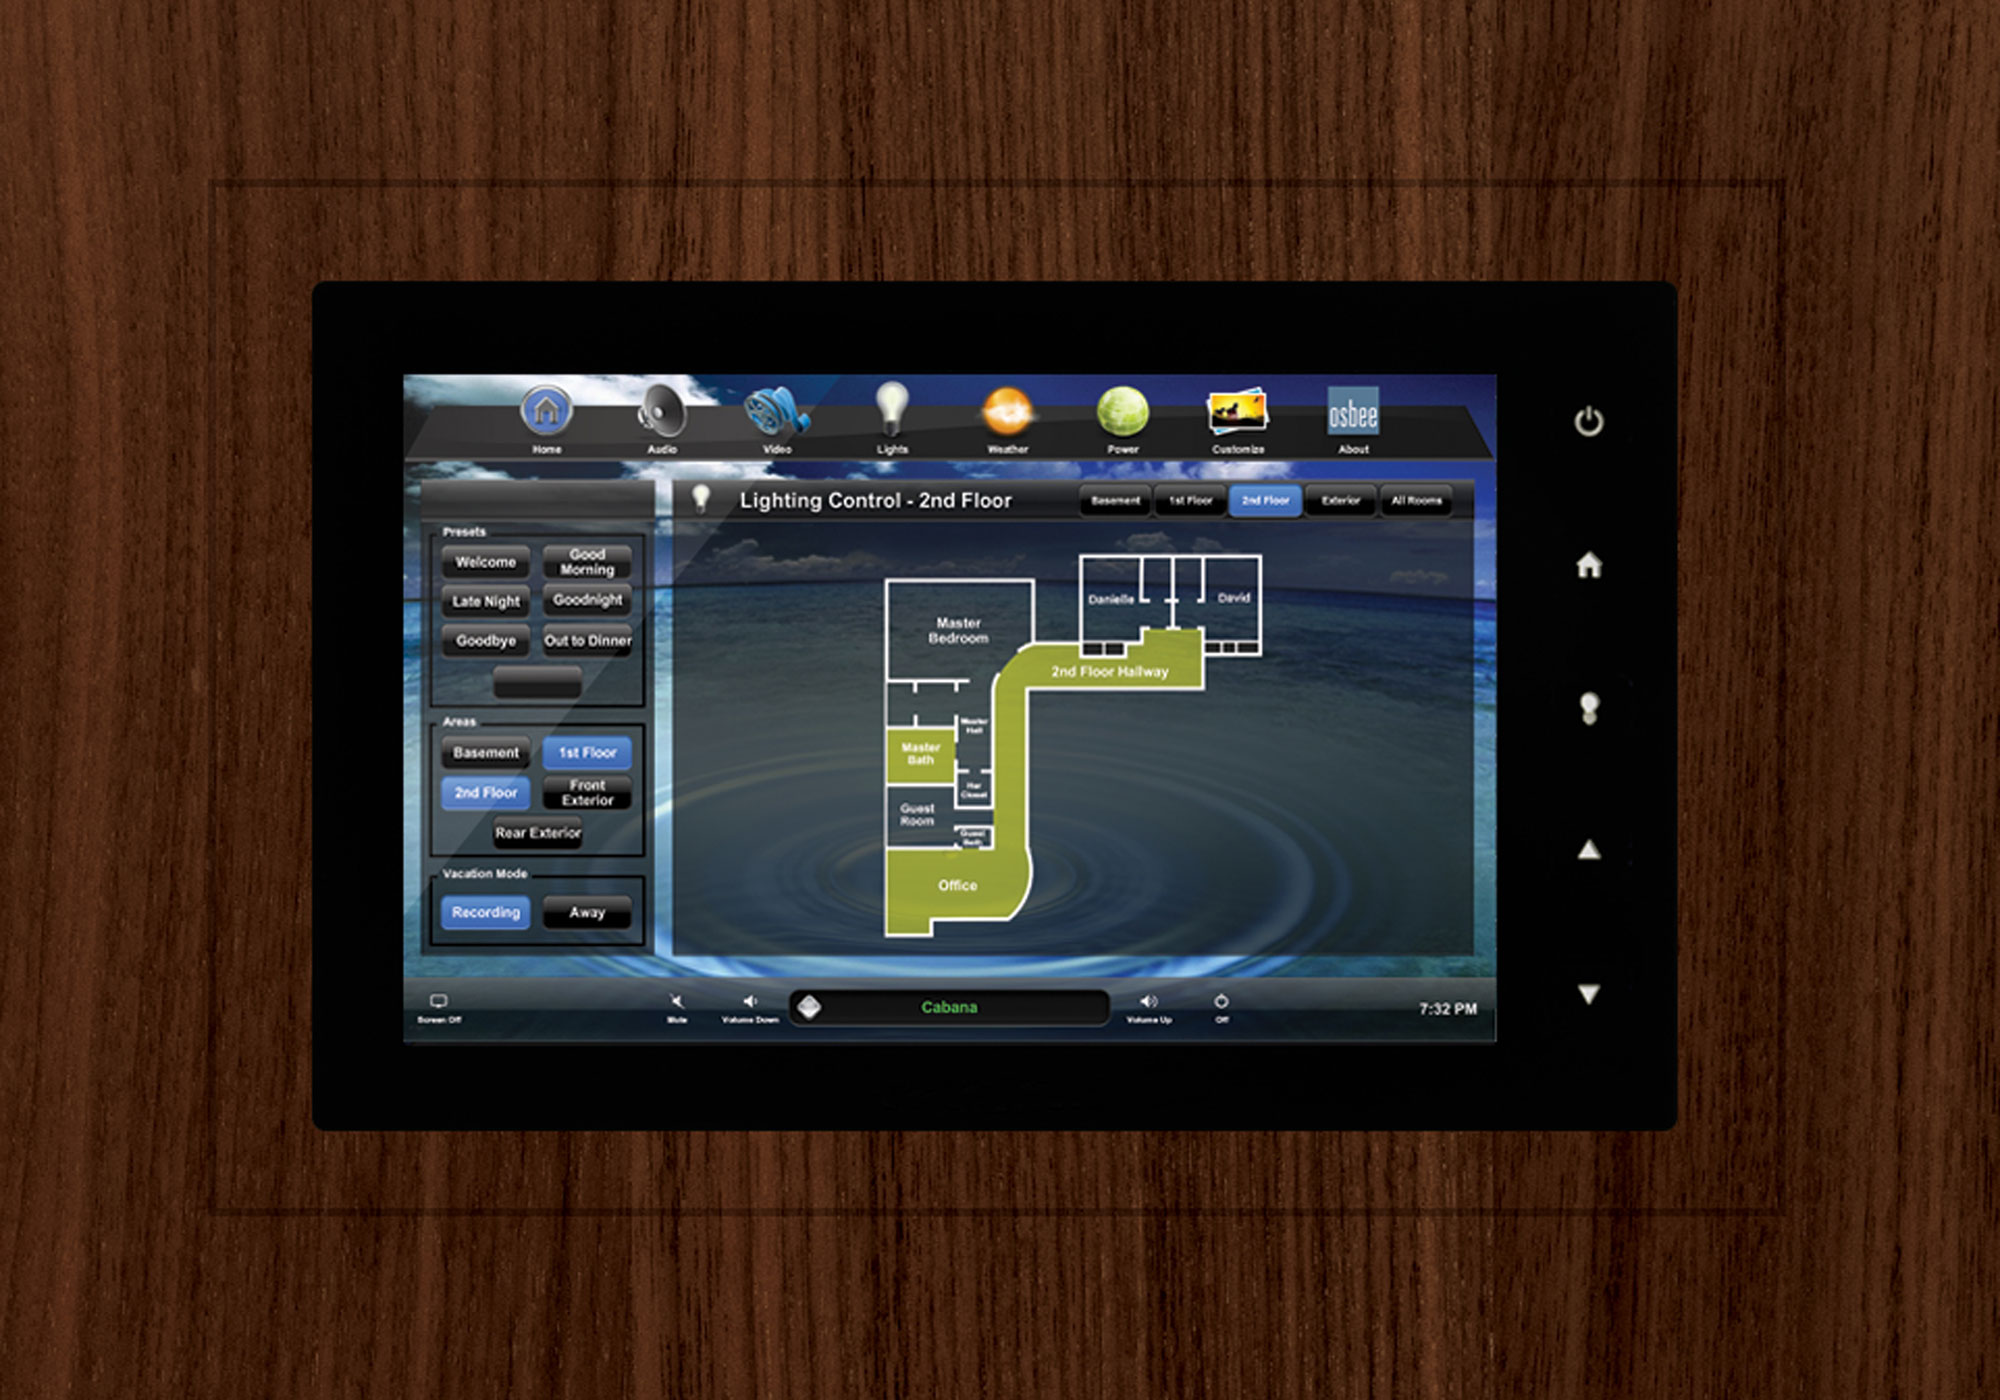 TruFig, flush-mount, touchscreen, wall-mount, lighting screen